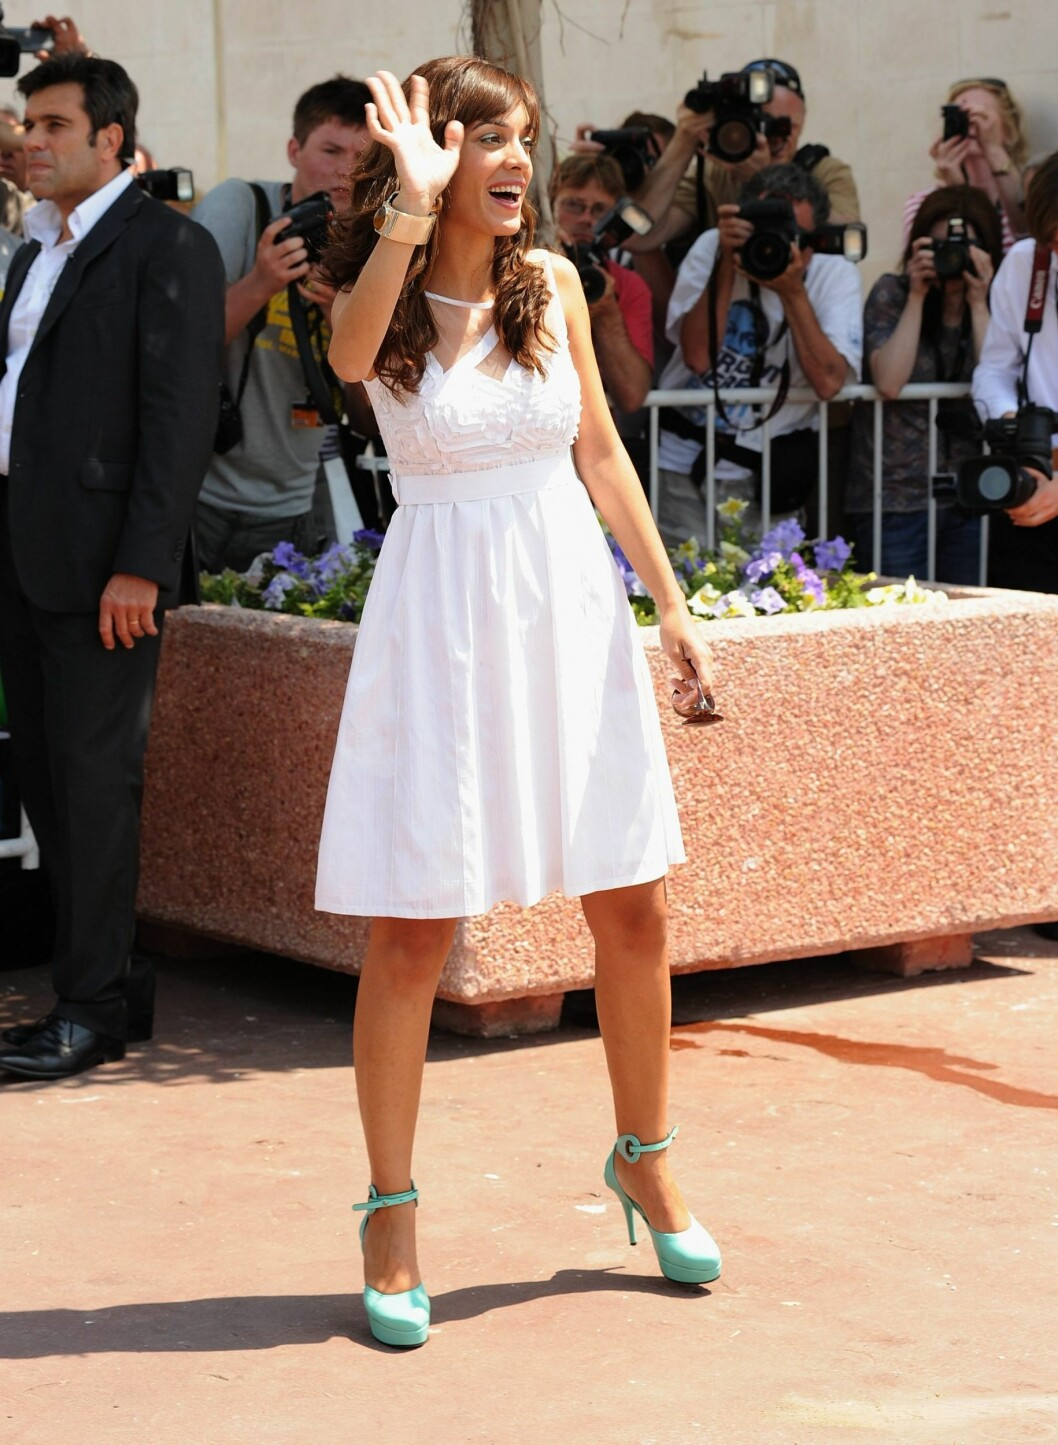 Jurymedlem Martina Gusman kombinerte hvit kjole med mintgrønne pumps og gullsmykker. Helt riktig på en solrik dag i Cannes, med andre ord.  Foto: All Over Press